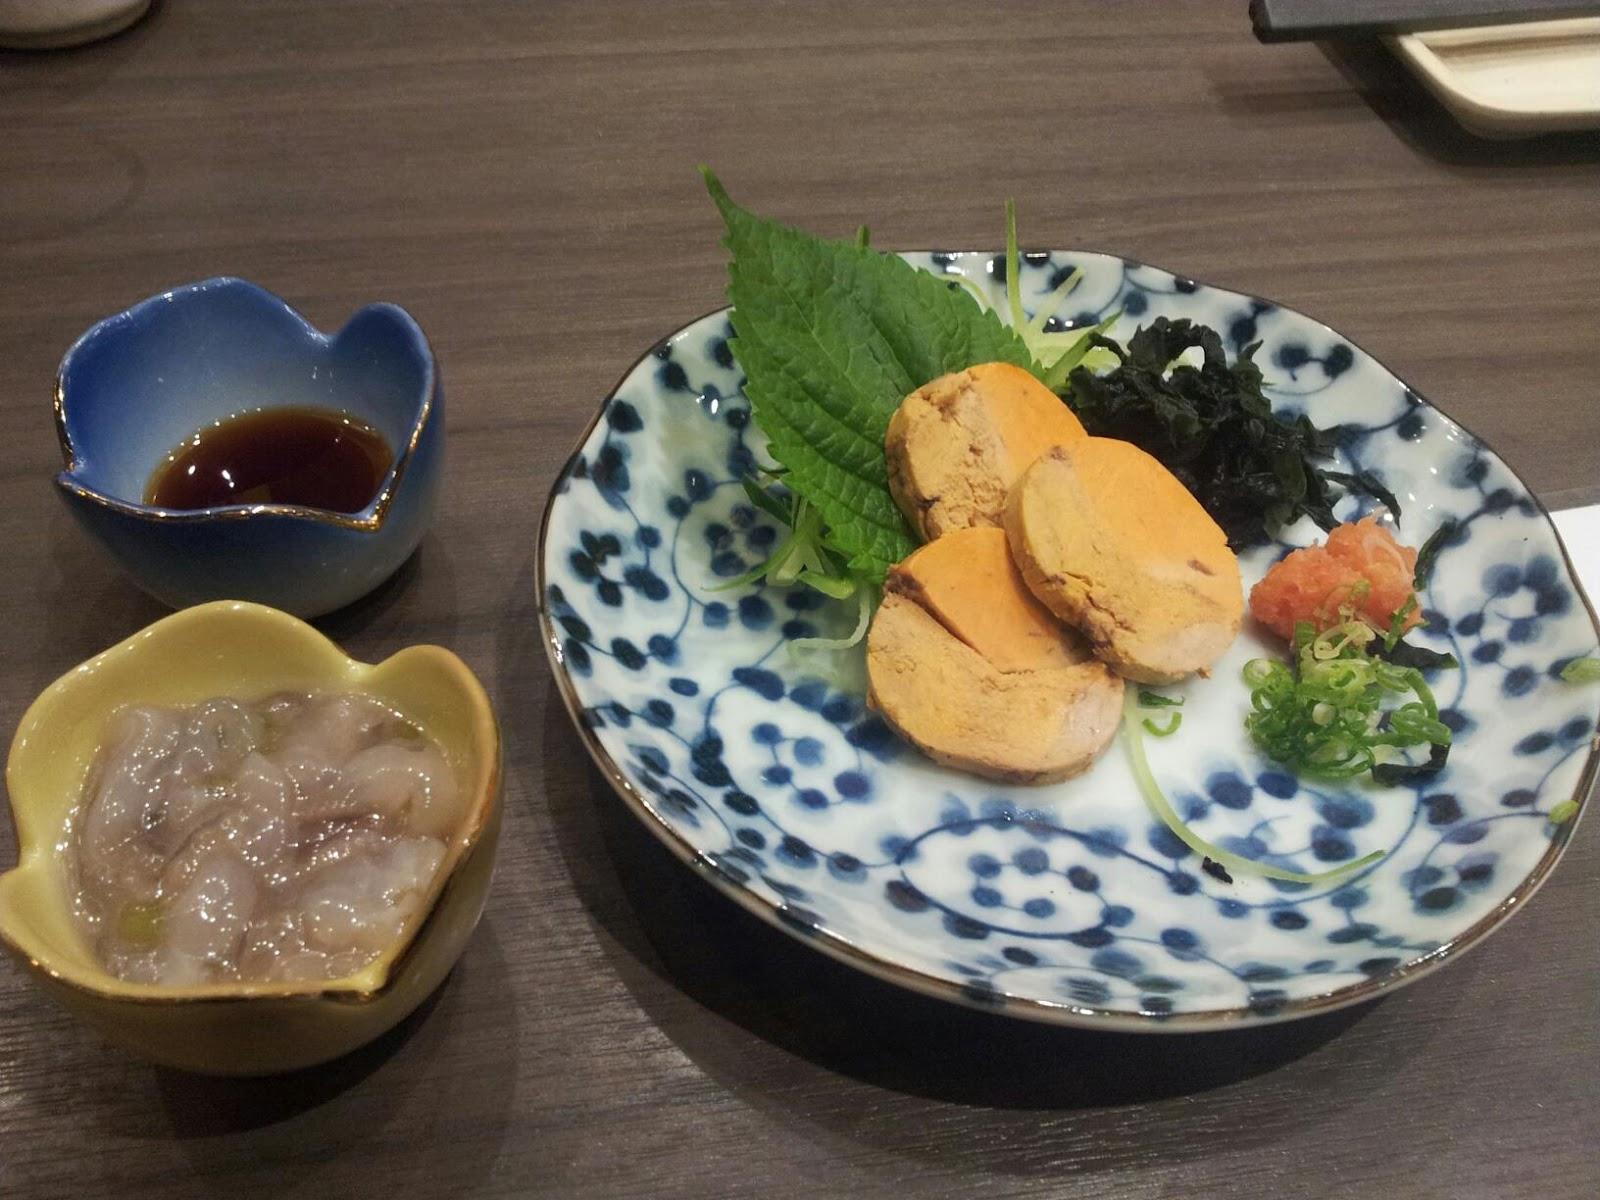 GuybinRex的9飲9食9玩網誌: 抵食的魚八水產